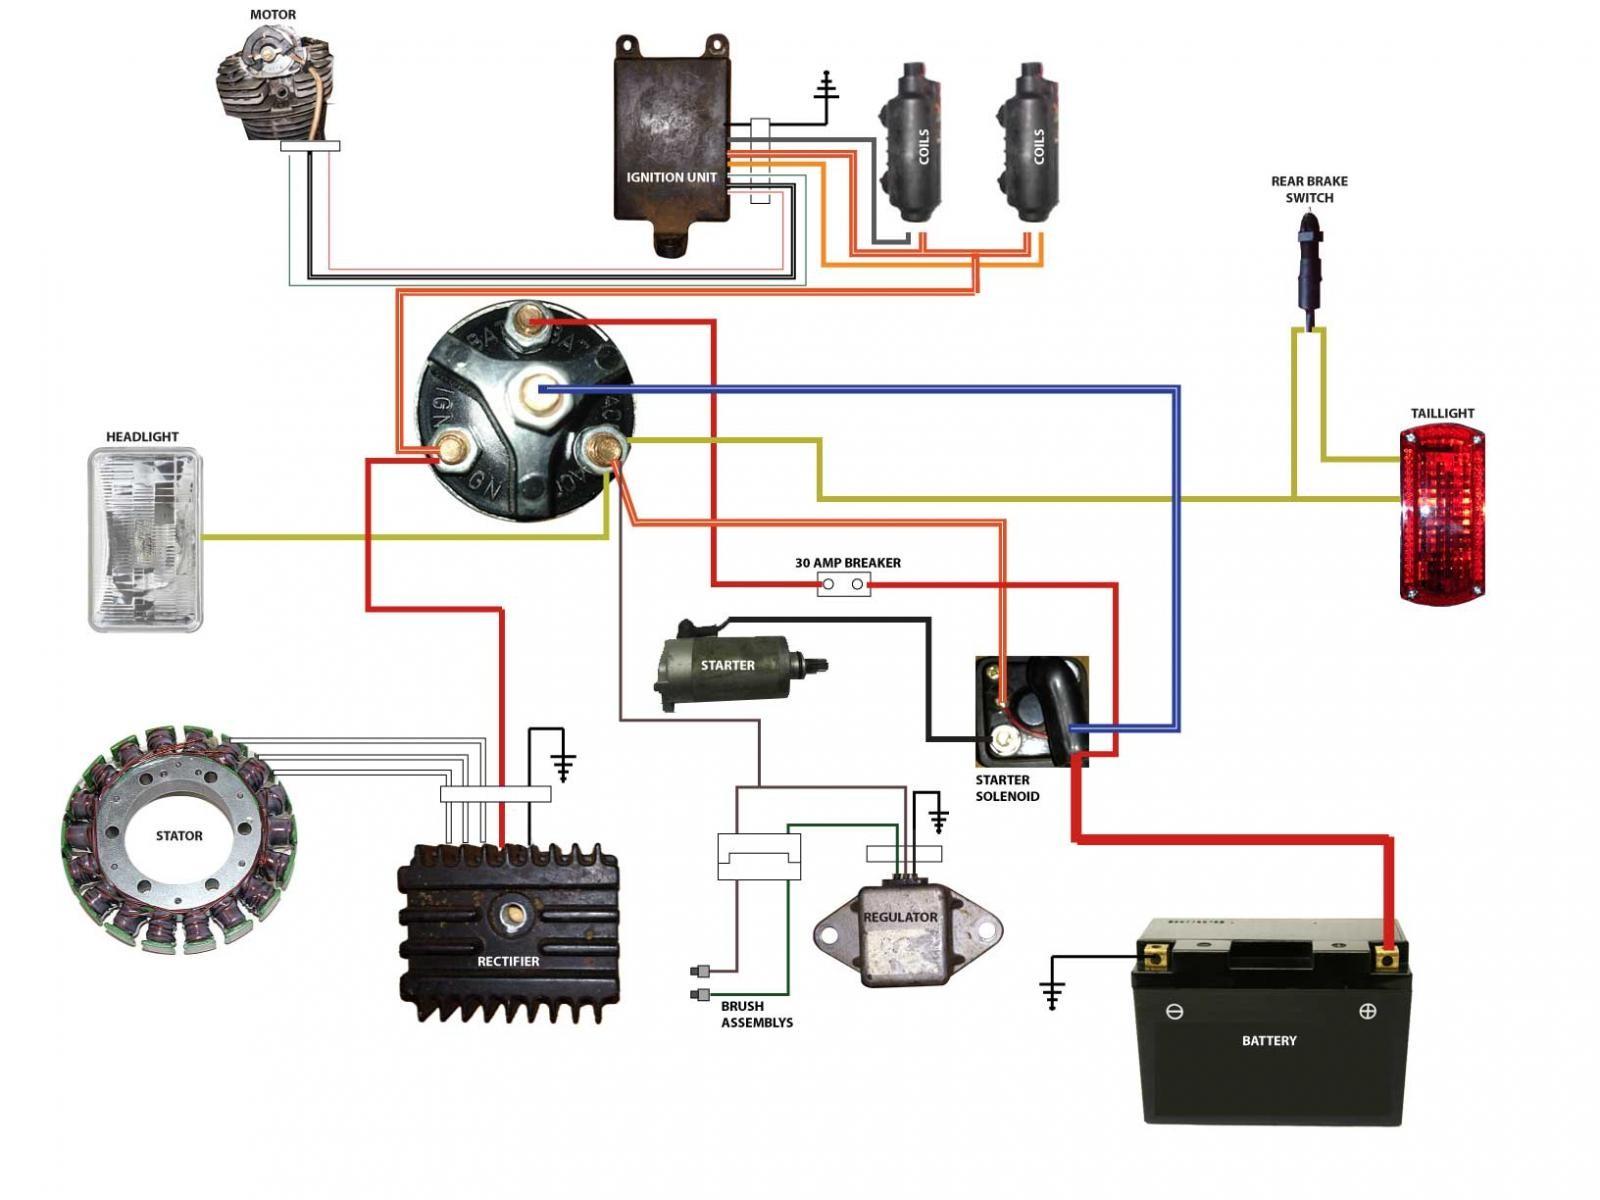 1980 honda cb400t wiring diagram 100k dual ganged stereo volume control library cb750 bobber diagramsdiagram hardkock chopper